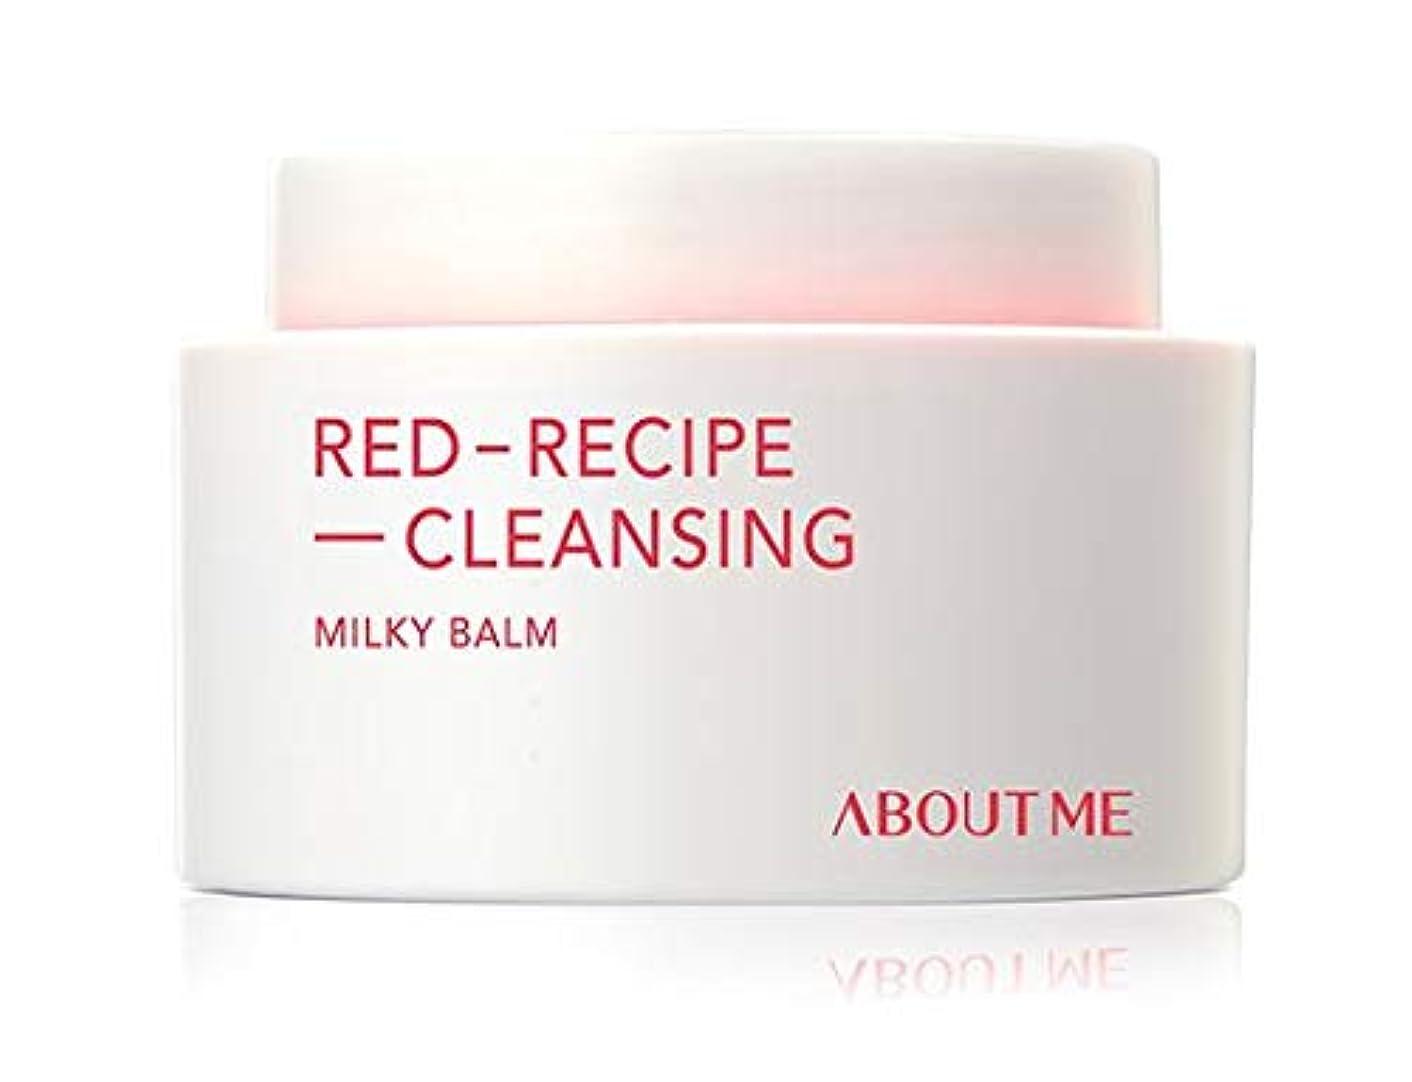 [ABOUT ME] RED RECIPE CLEANSING MILKY BALM 90ml / [アバウトミー] レッド レシピ クレンジング ミルキー バーム 90ml [並行輸入品]